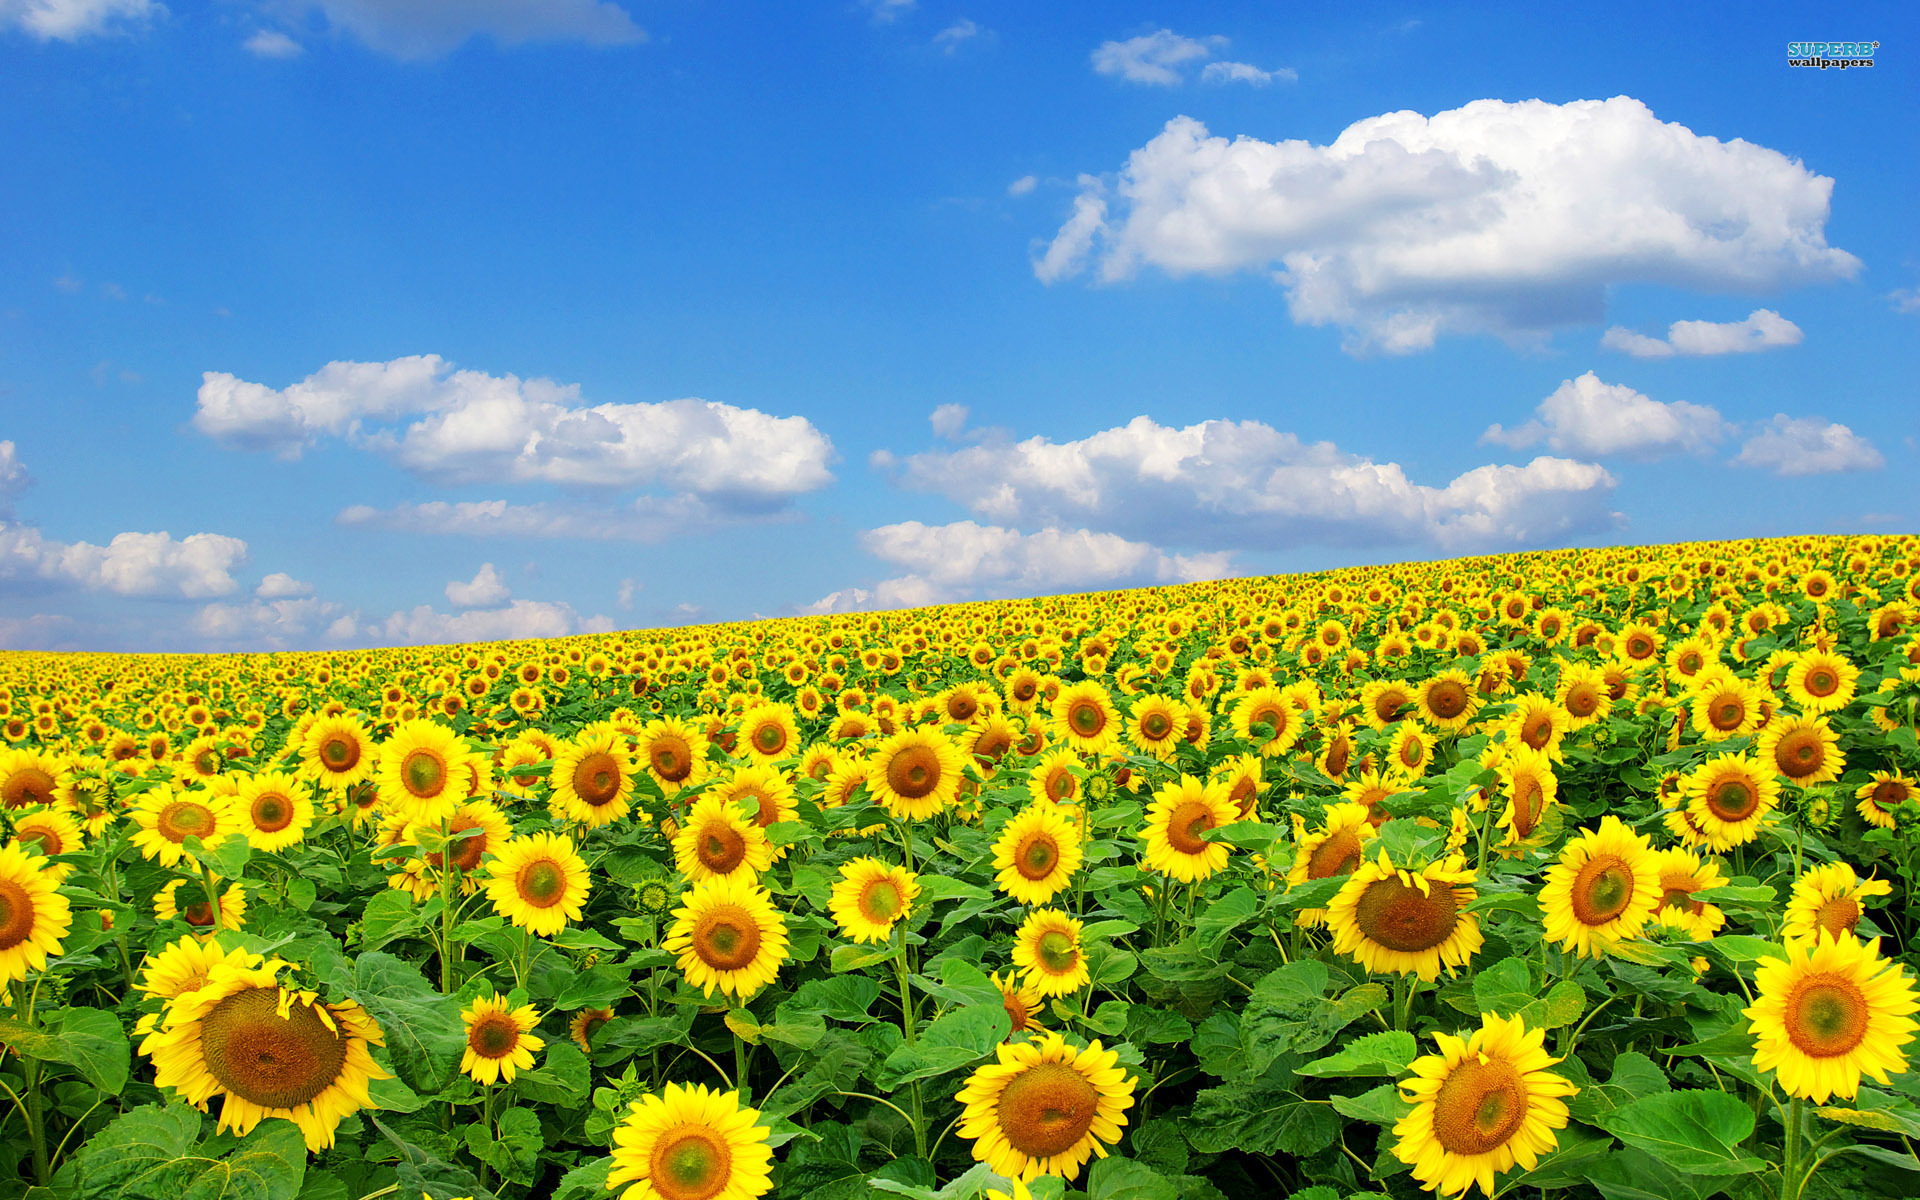 Wallpaper clipart sunflower Px Field Drawing HD Very